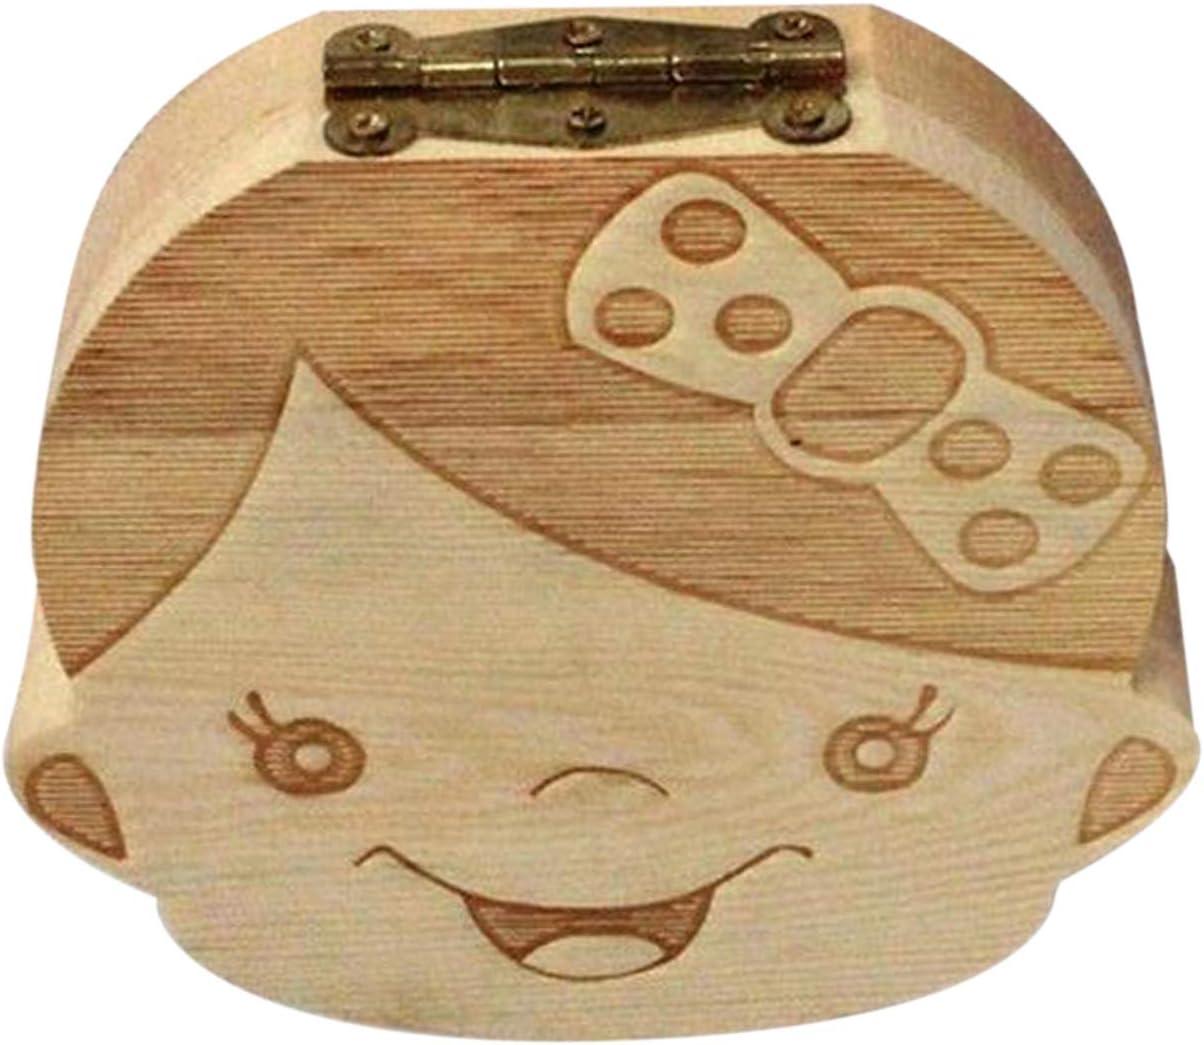 FayOK Creative Baby Teeth Box Saver Storage Box Wooden Children Teeth Holder Organize Box Milk Teeth Keepsake for Girls Boys